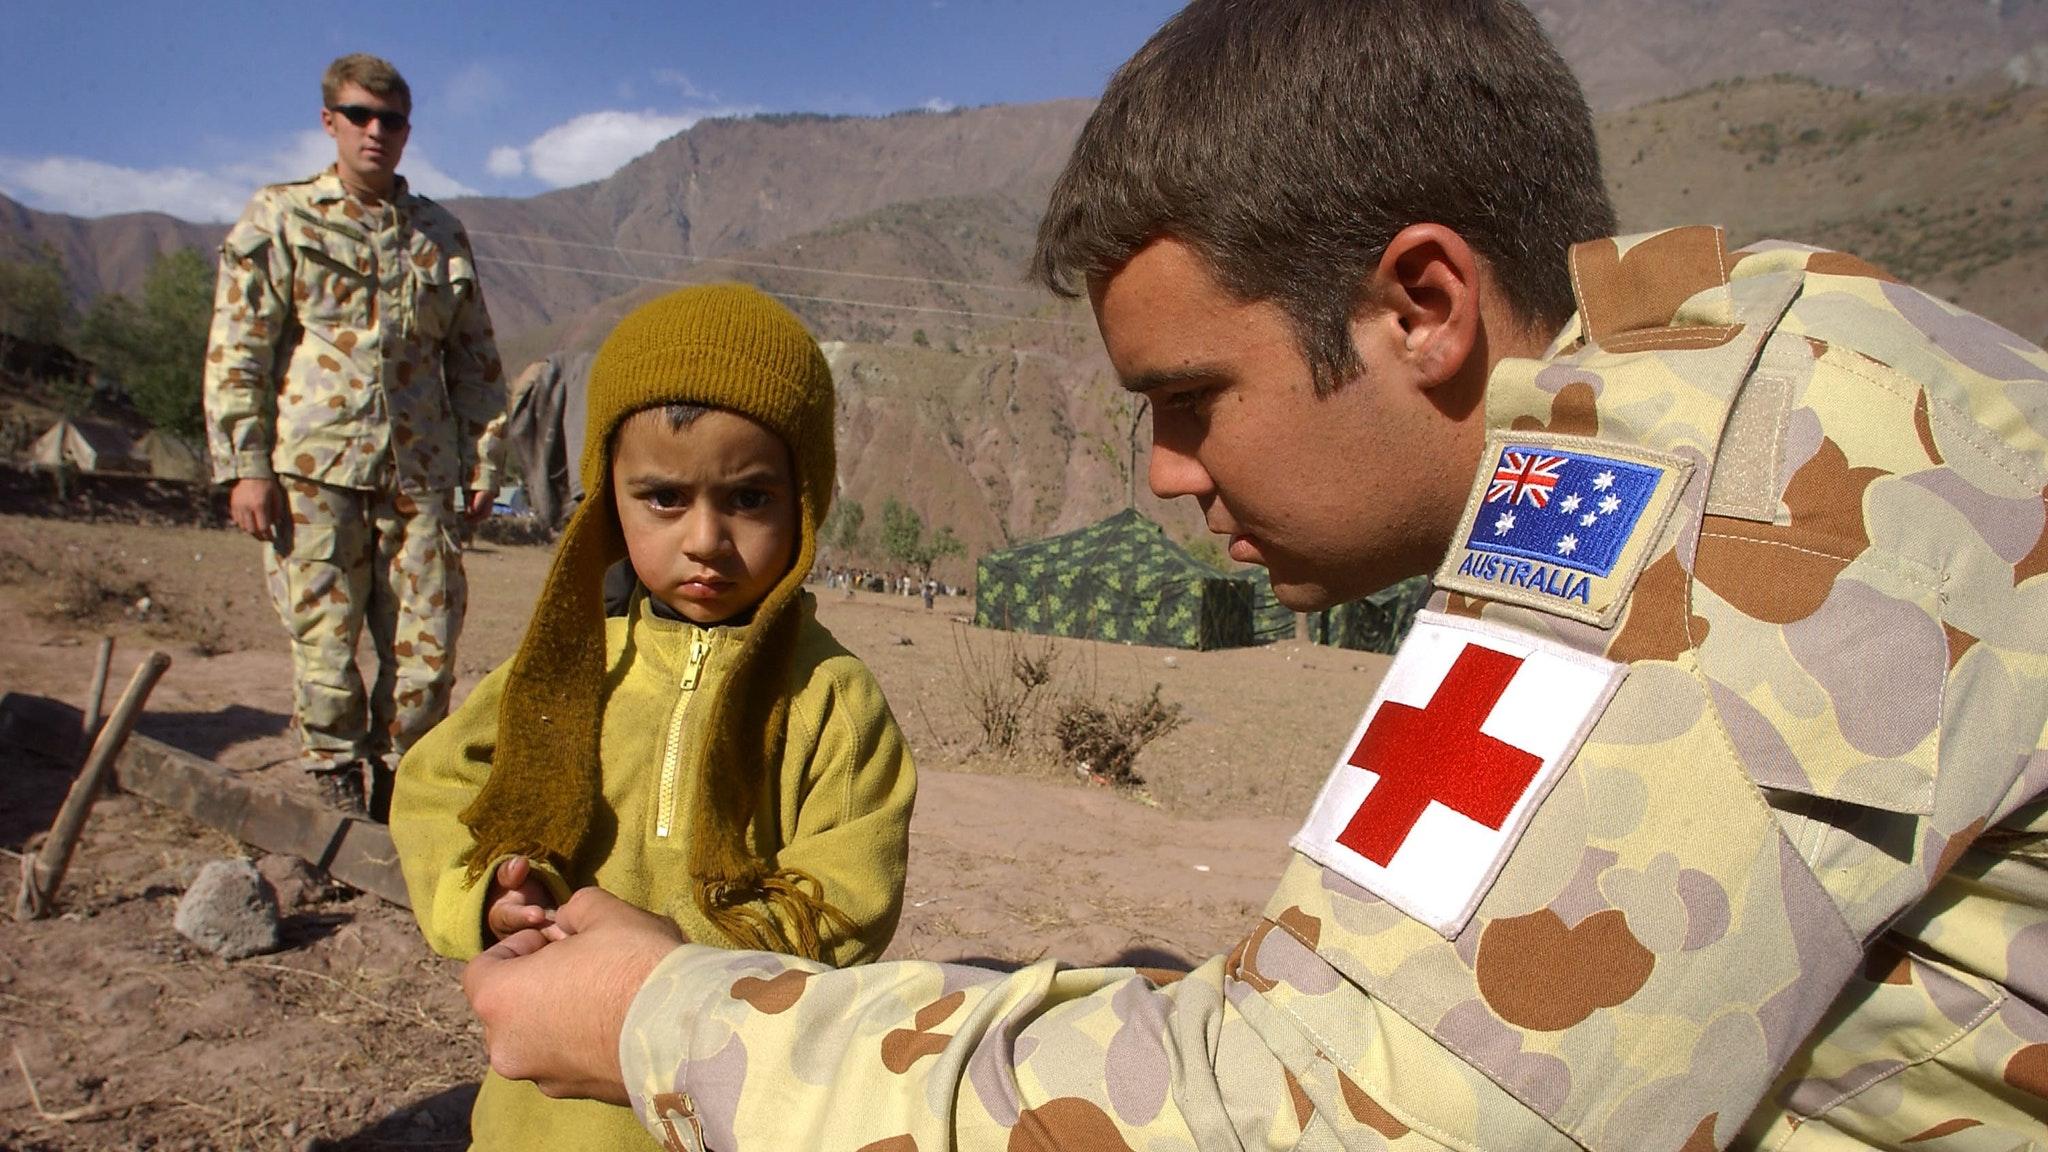 Private Robbie Keenan, an Australian Army medic deployed on OP Pakistan Assist